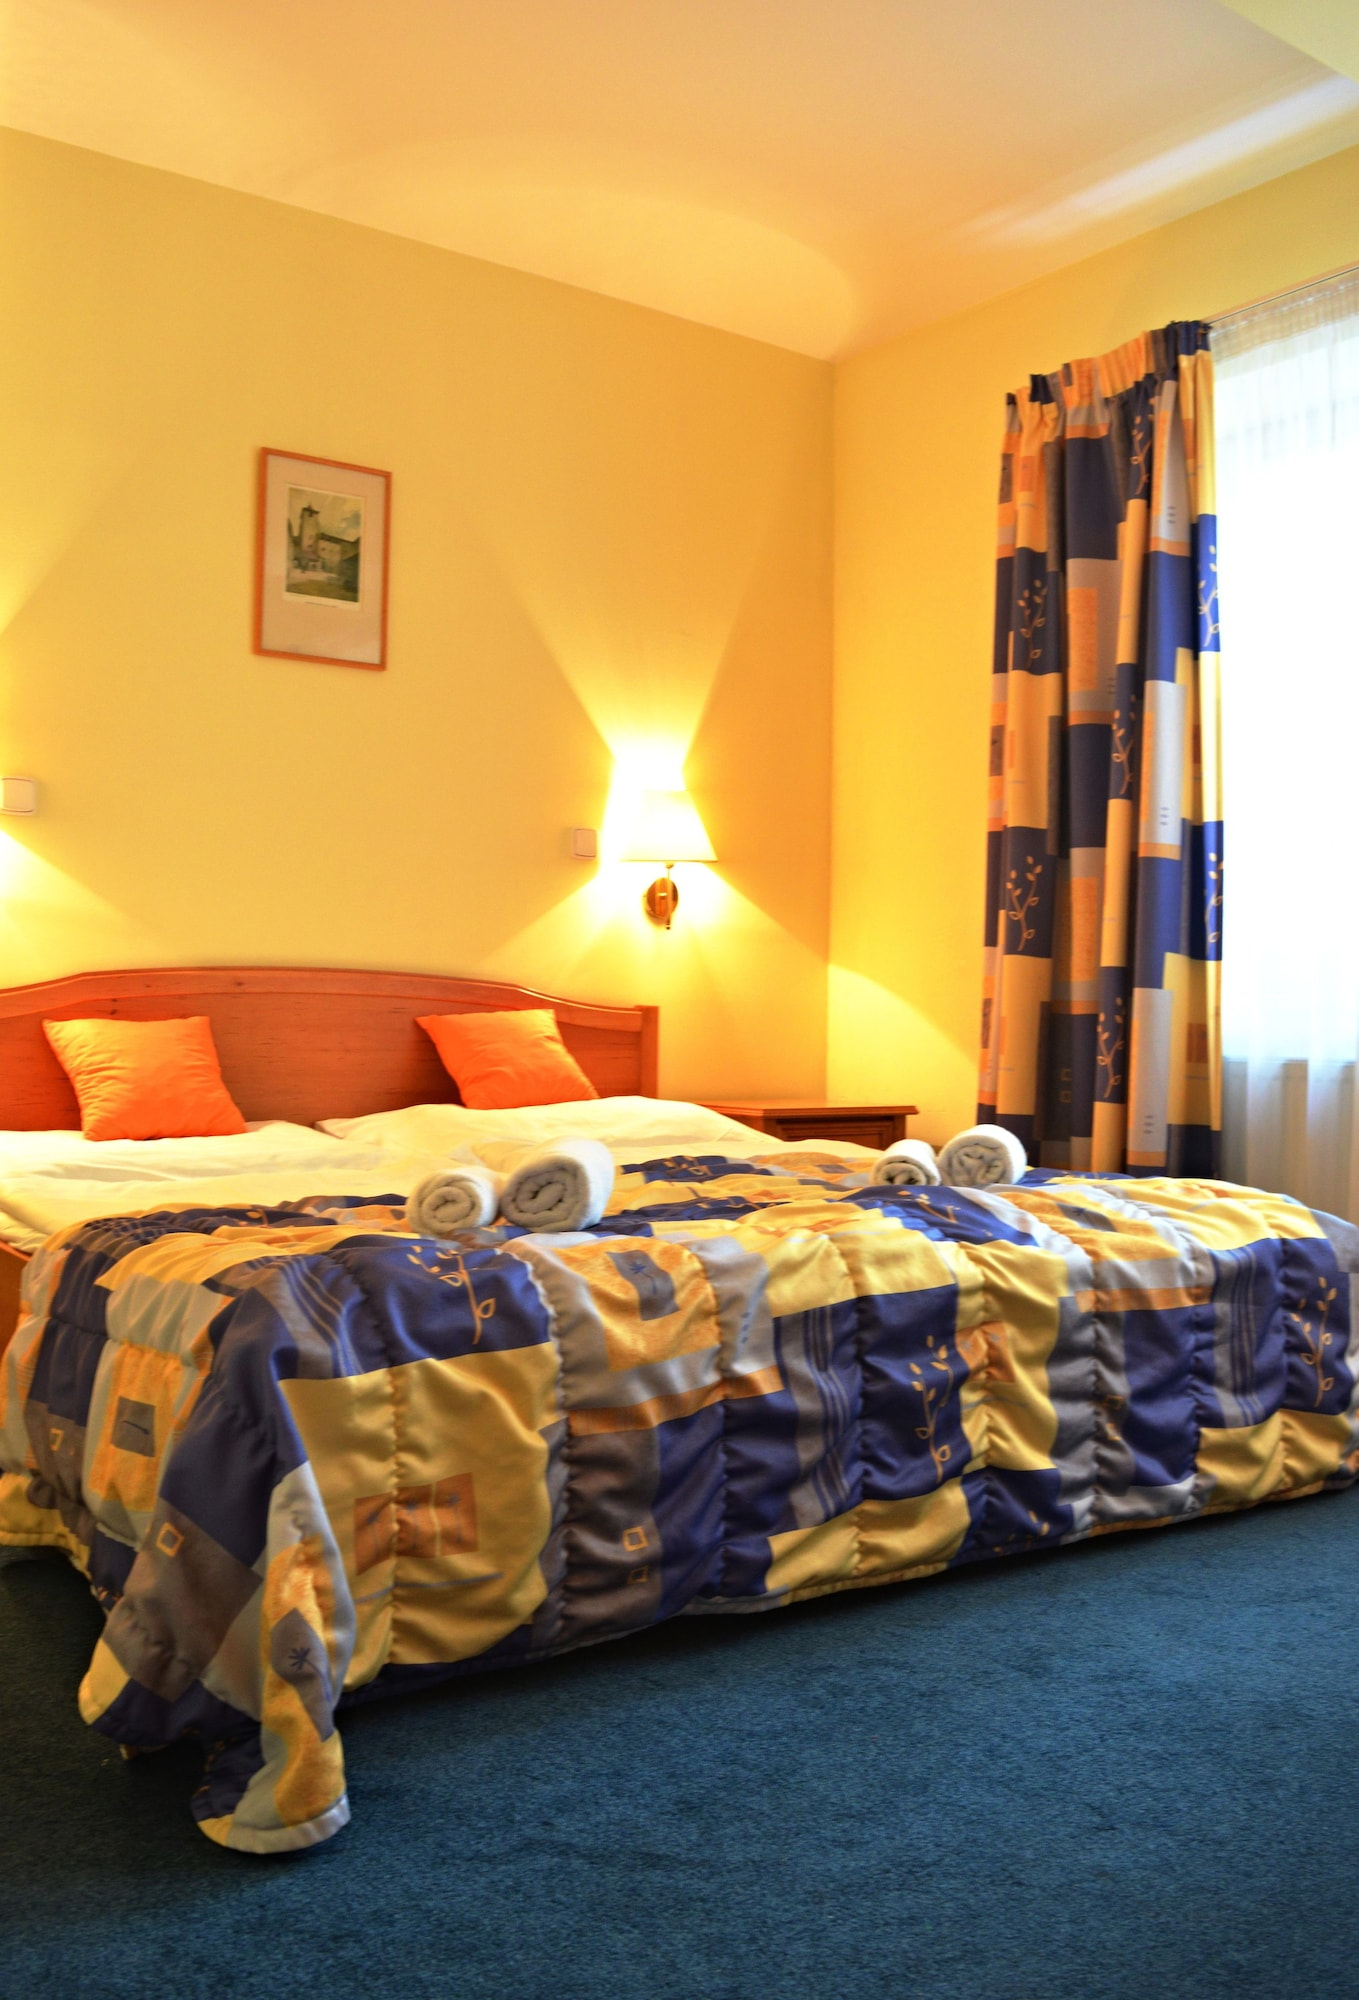 Hotel Claris & Residence Abacta, Praha 1